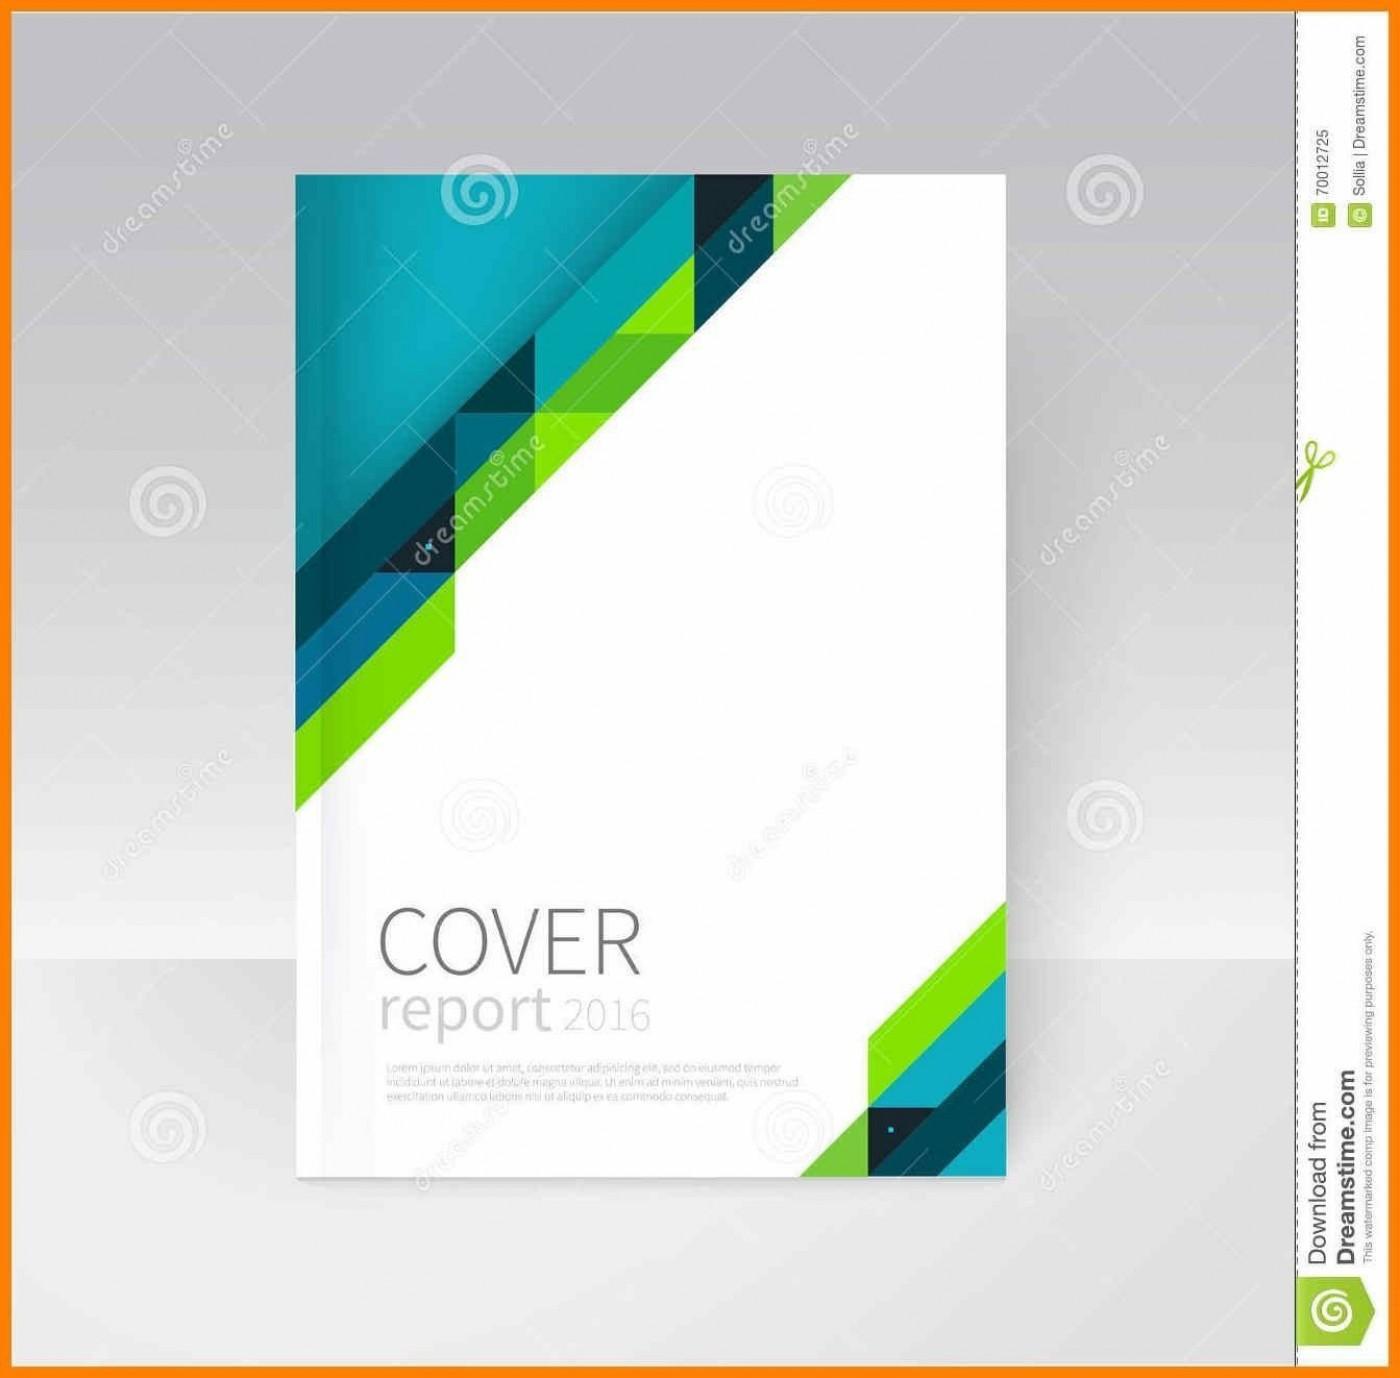 000 Fascinating Microsoft Word Template Download High Resolution  M Cv Free Header1400